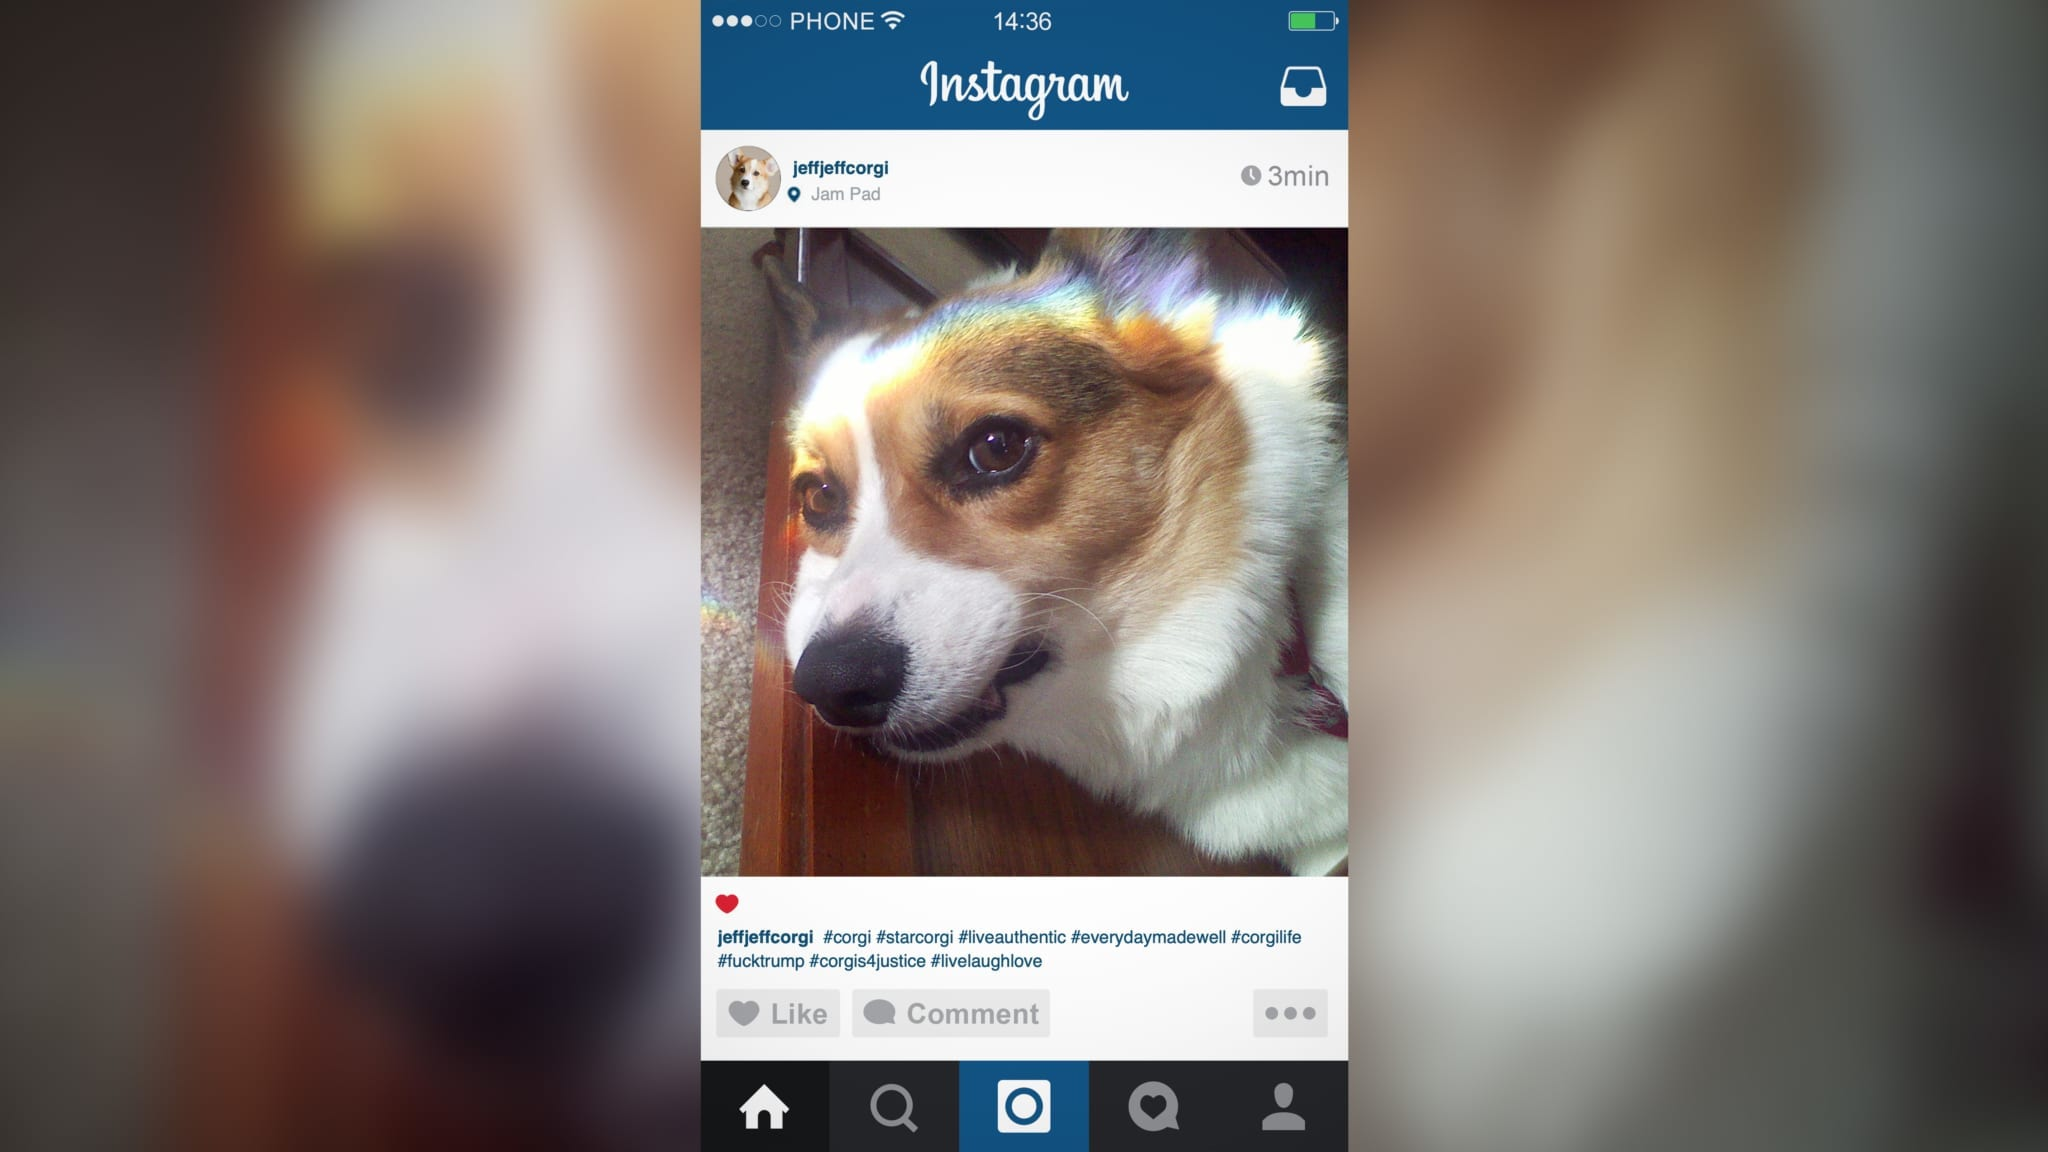 Corgi Instagram Influencer Not Even Grateful For Owner Buying Followers